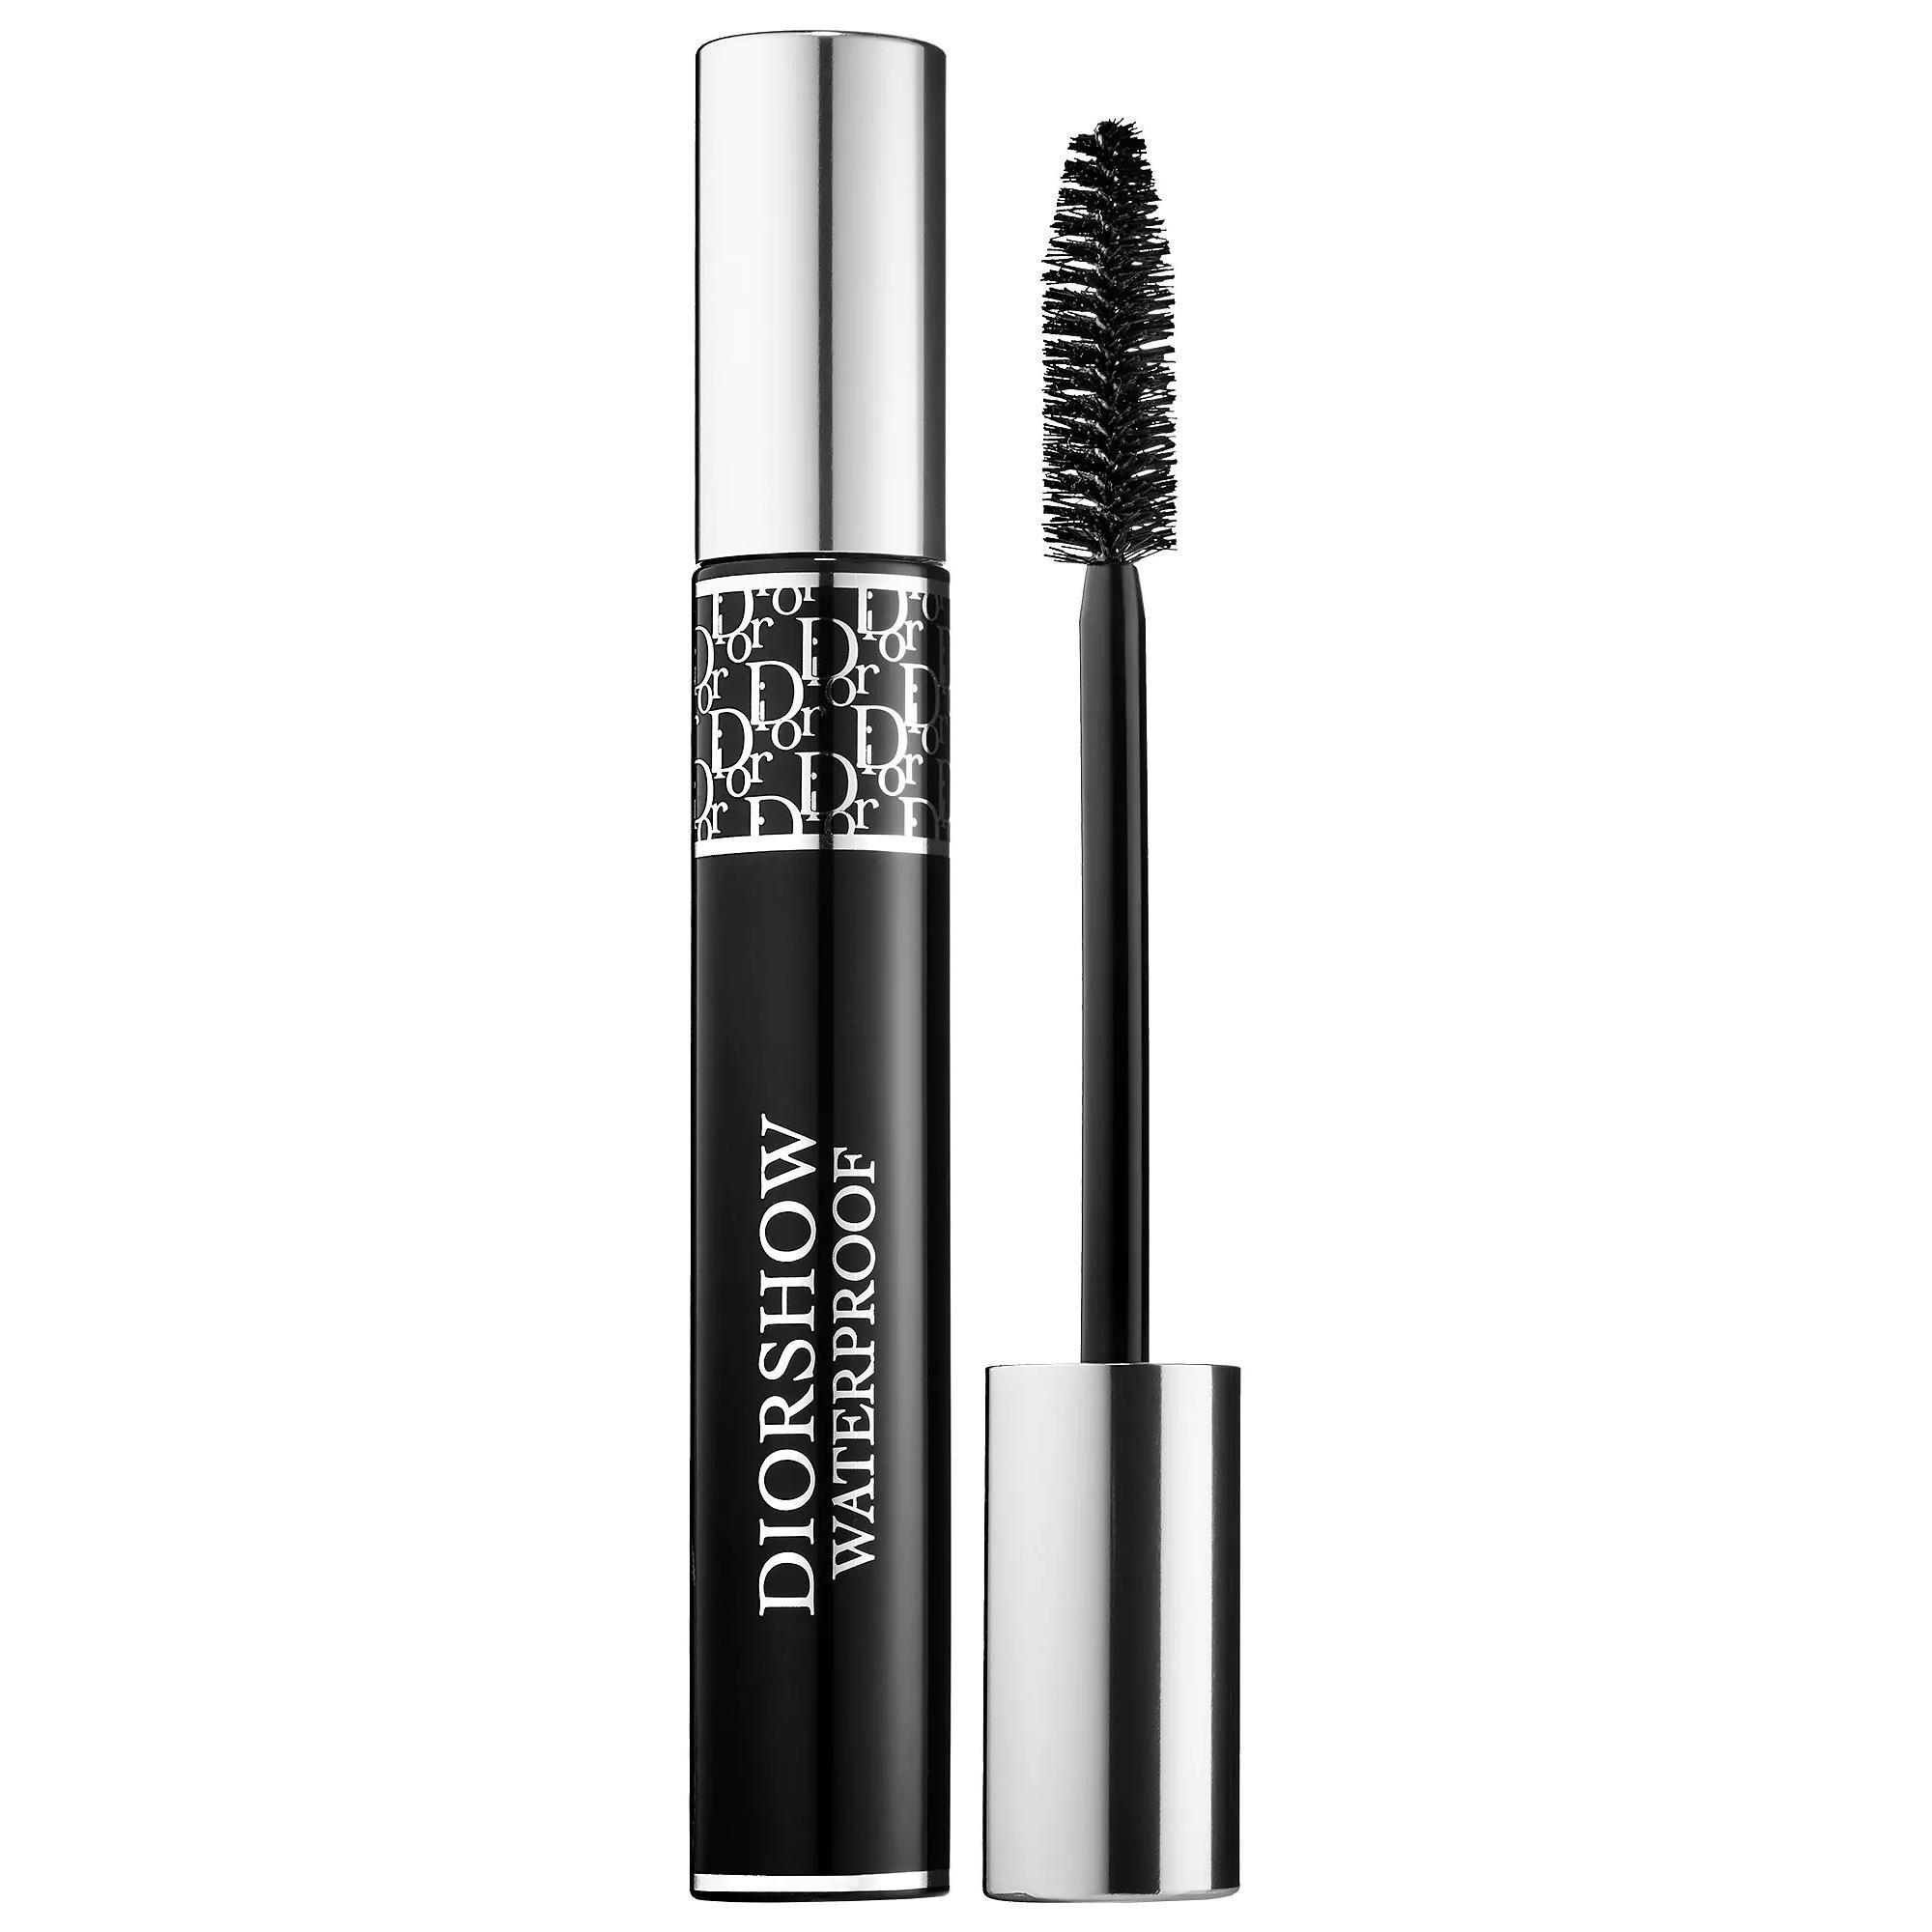 Dior Diorshow Waterproof Mascara Catwalk Black 090